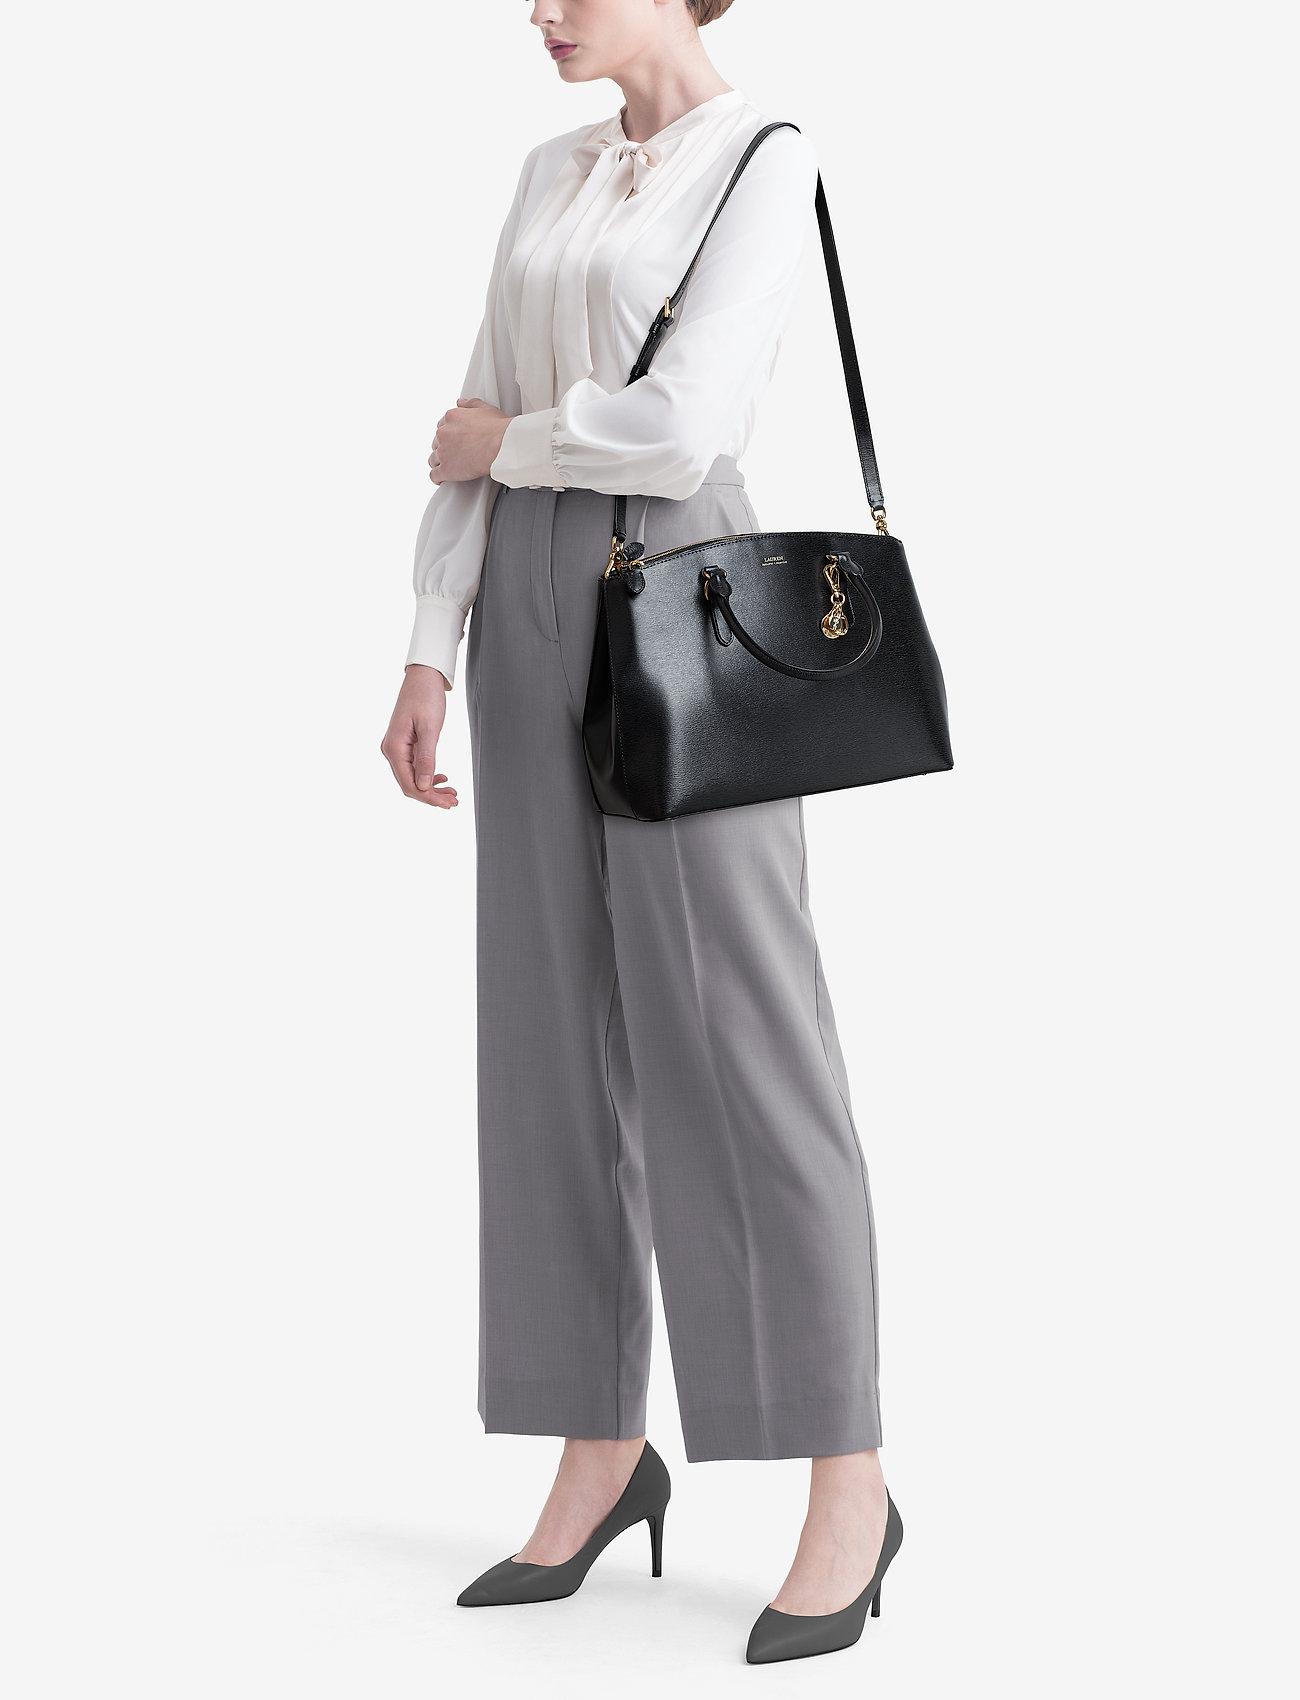 Lauren Ralph Lauren Saffiano Leather Large Satchel - BLACK